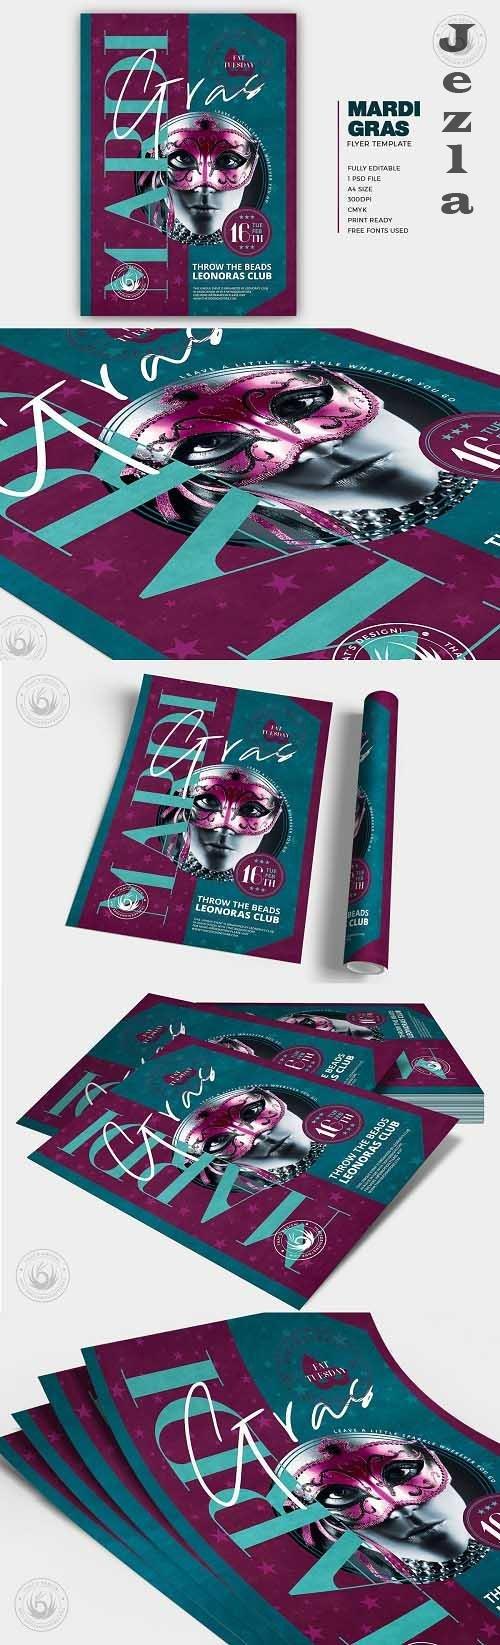 Mardi Gras Flyer Template V4 - 5764564